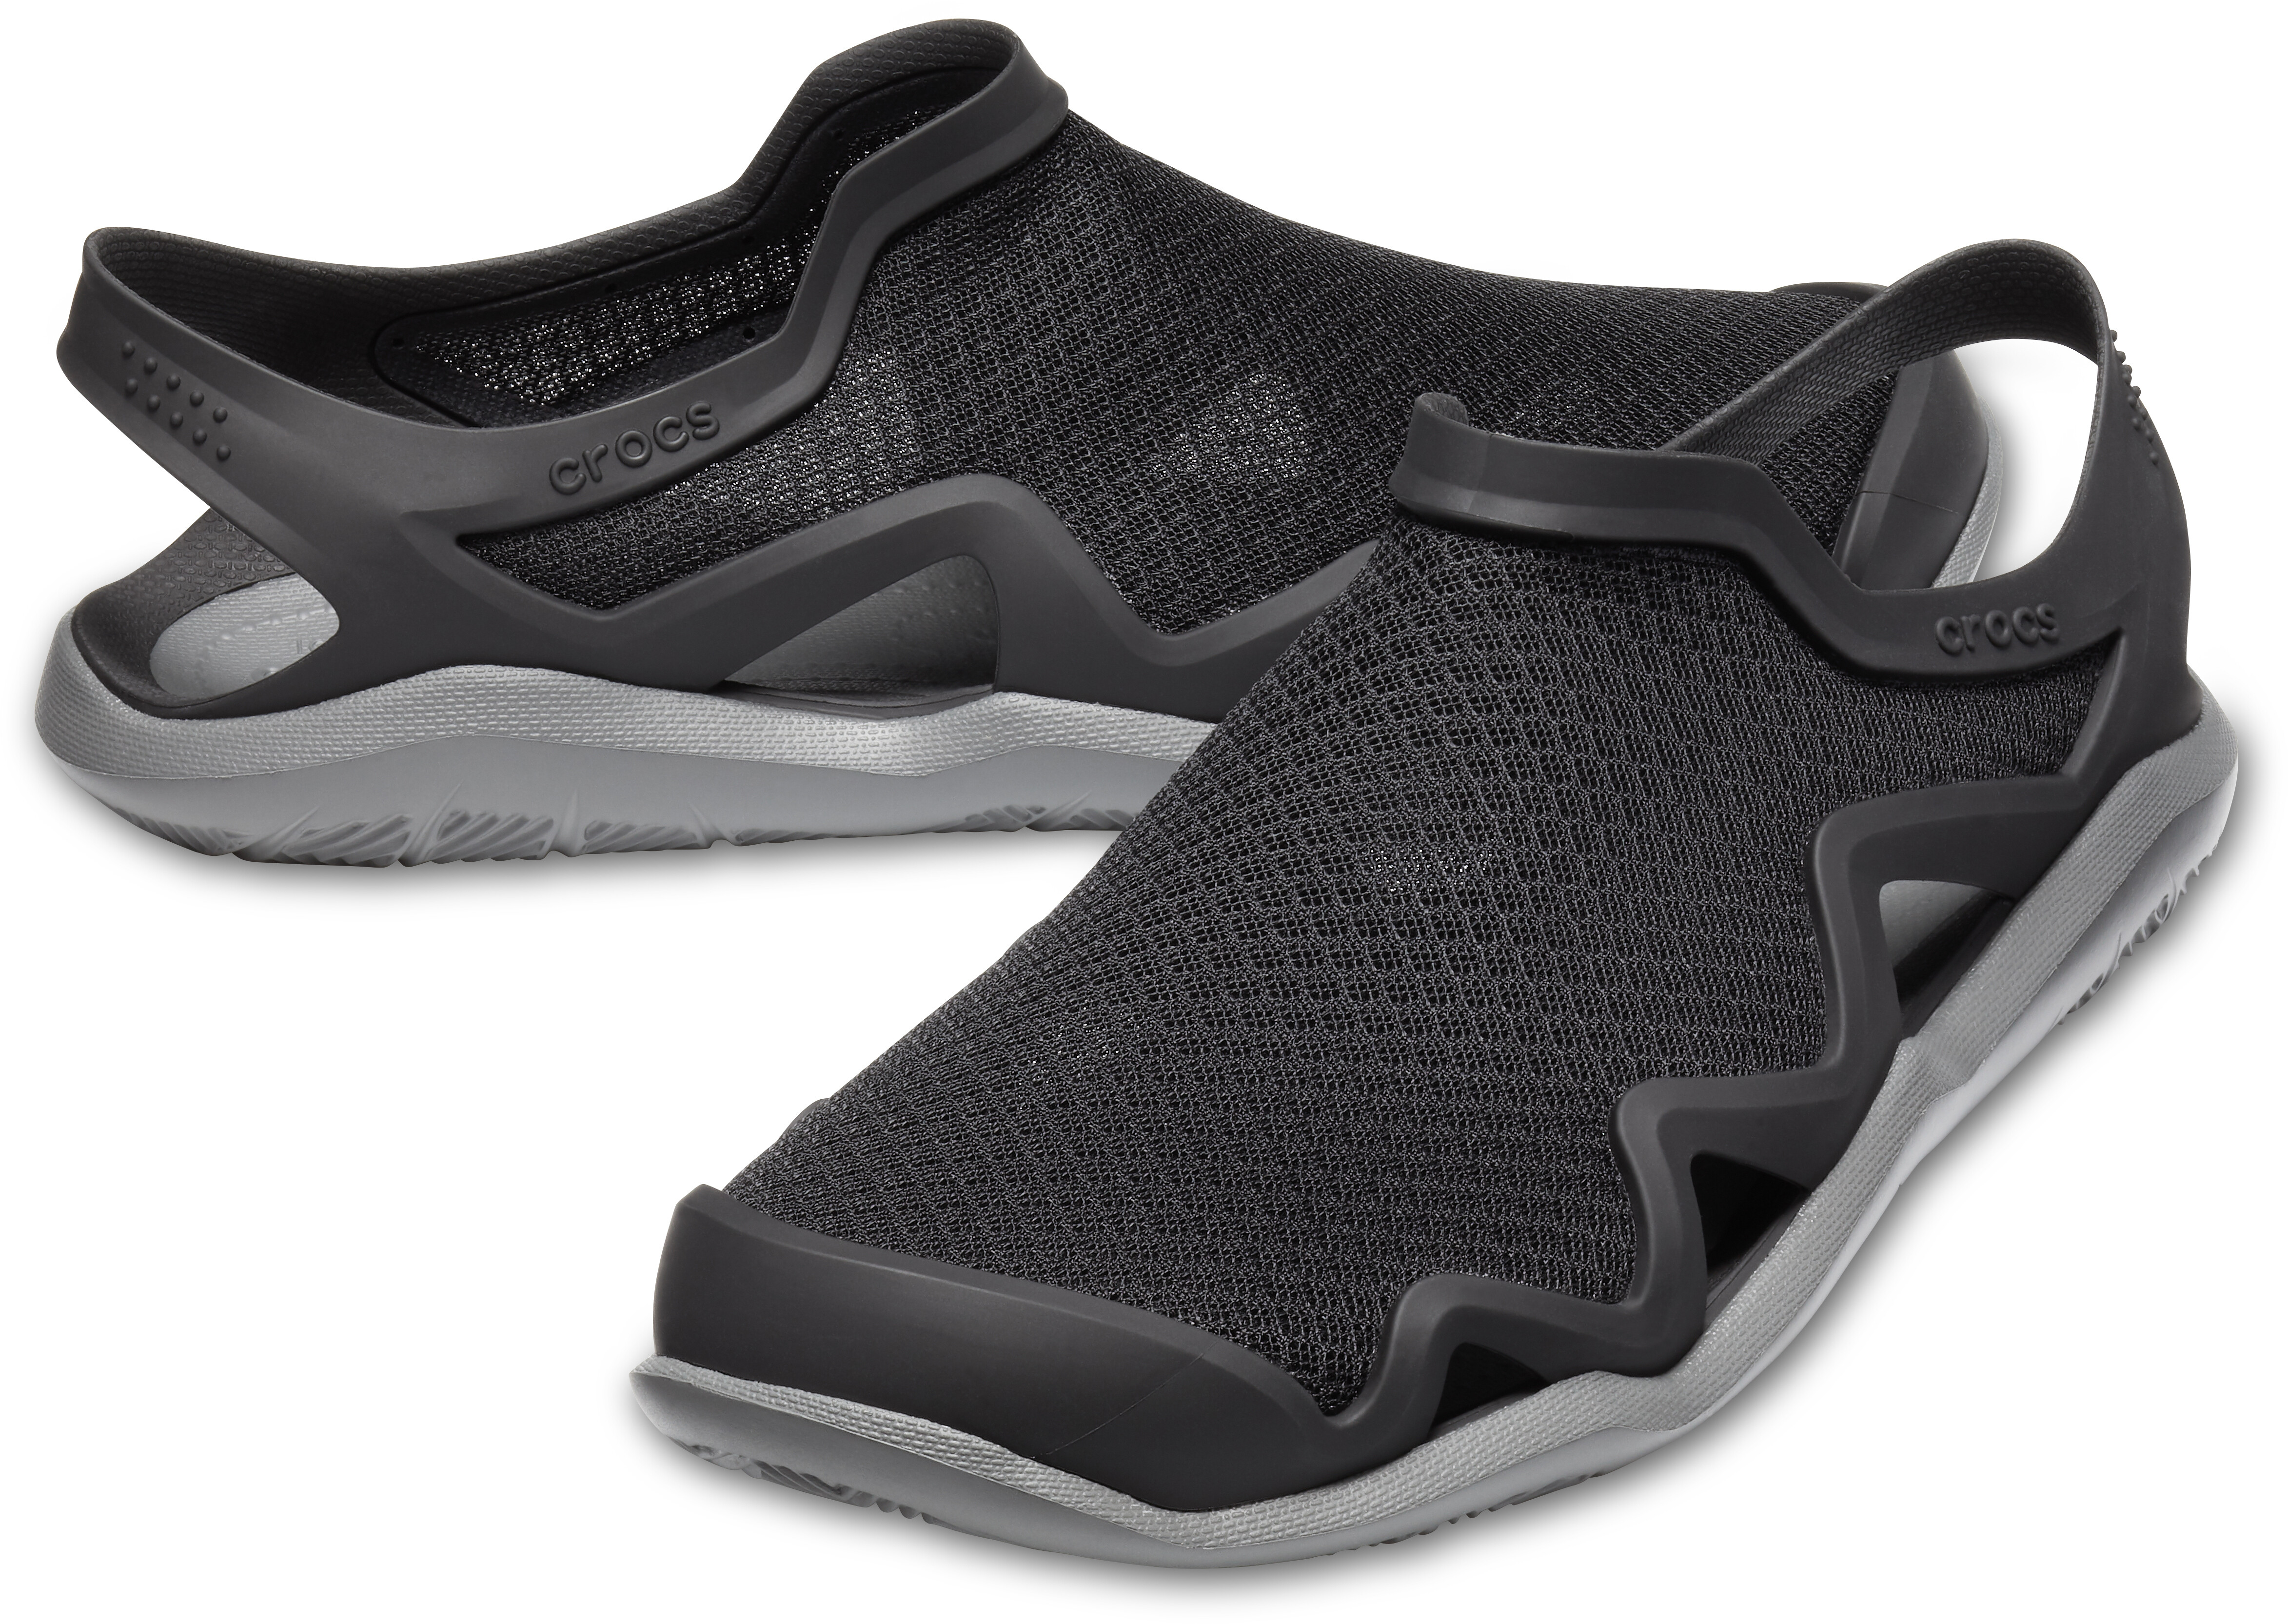 78dc581d78d8 Crocs Swiftwater Mesh Wave Sandals Men black slate grey at Addnature ...